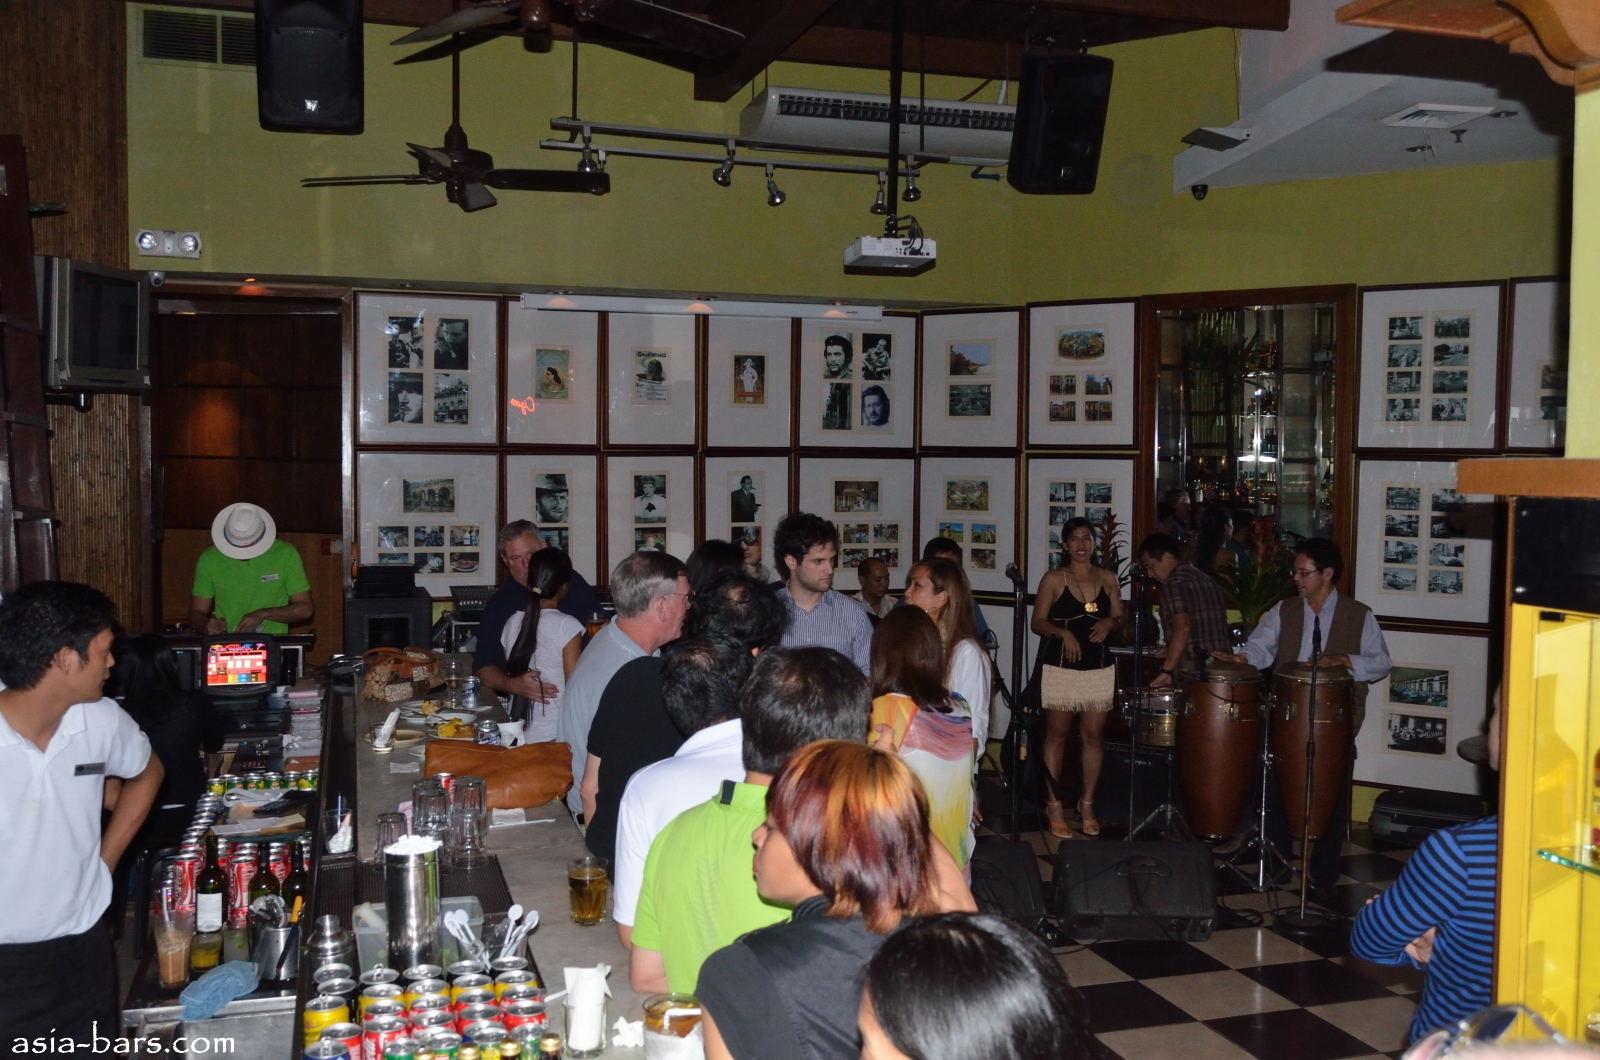 Cafe Havana Greenbelt Opening Hours